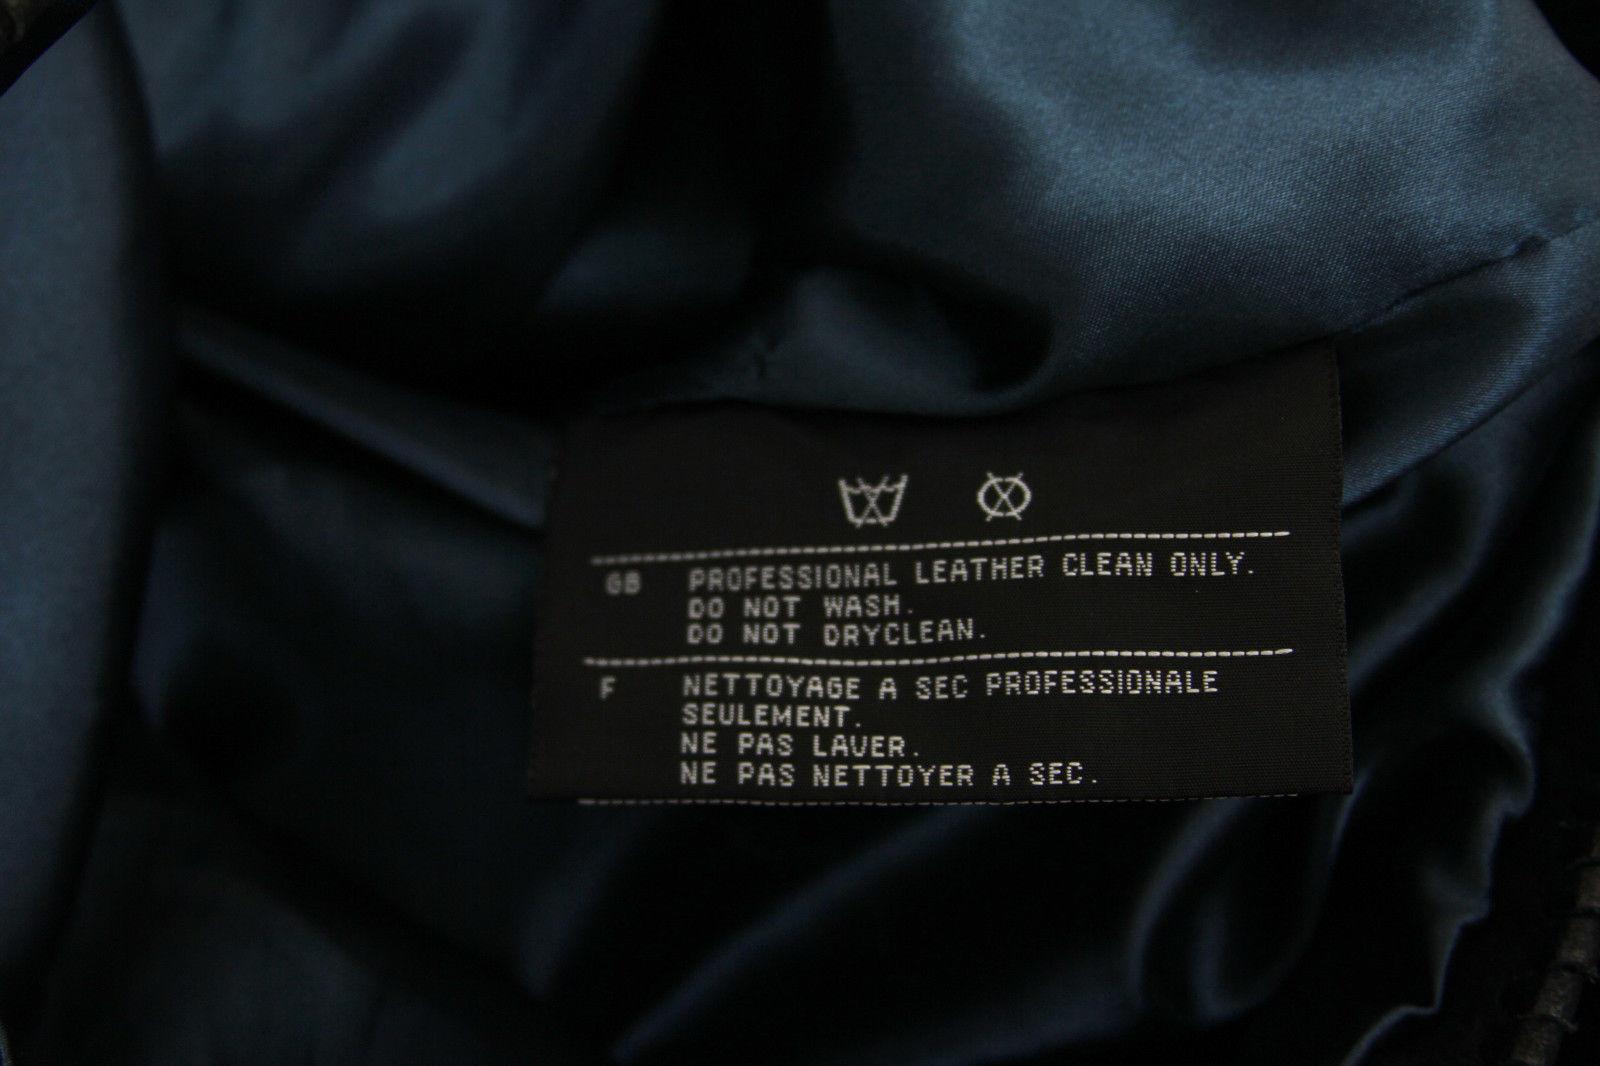 478e3fa894e Harley Davidson Motorcycle Women s Heavy Duty Leather Jacket Braided Trim  Sz LW